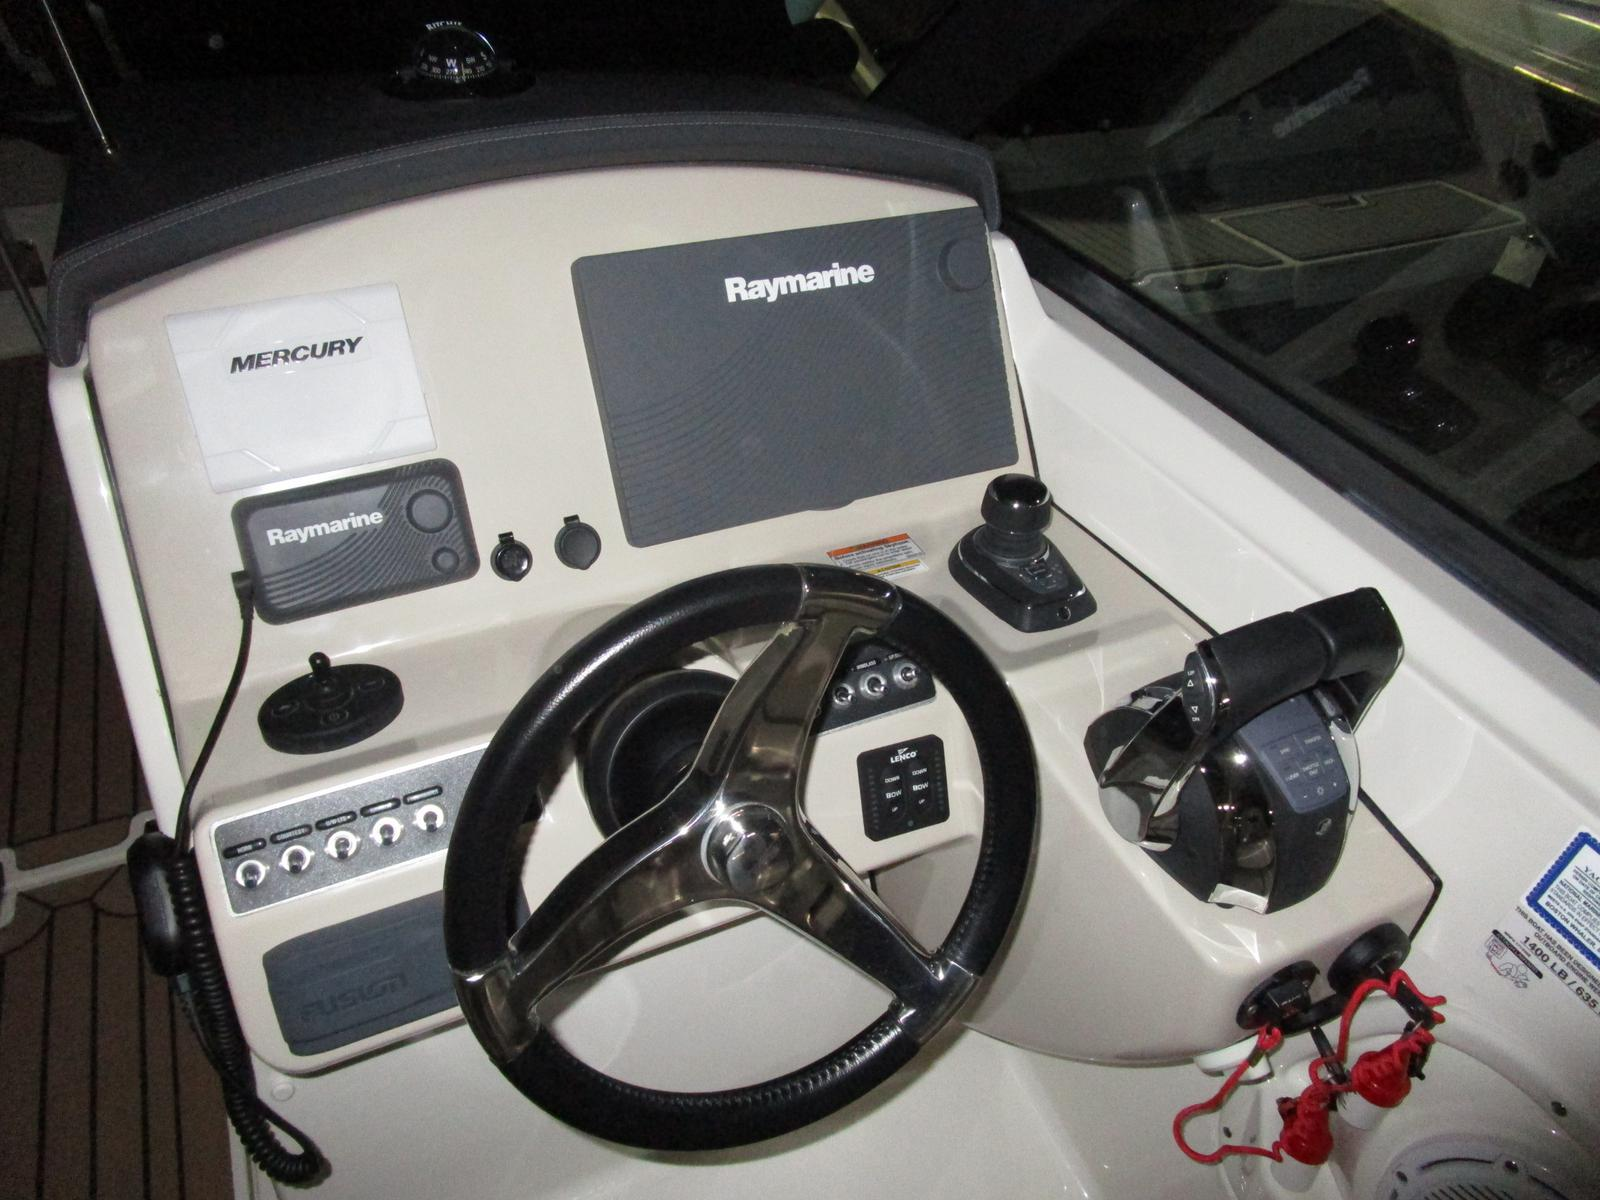 2017 Boston Whaler boat for sale, model of the boat is 270 Vantage Freshwater, Joystick, Loaded!!! & Image # 8 of 14